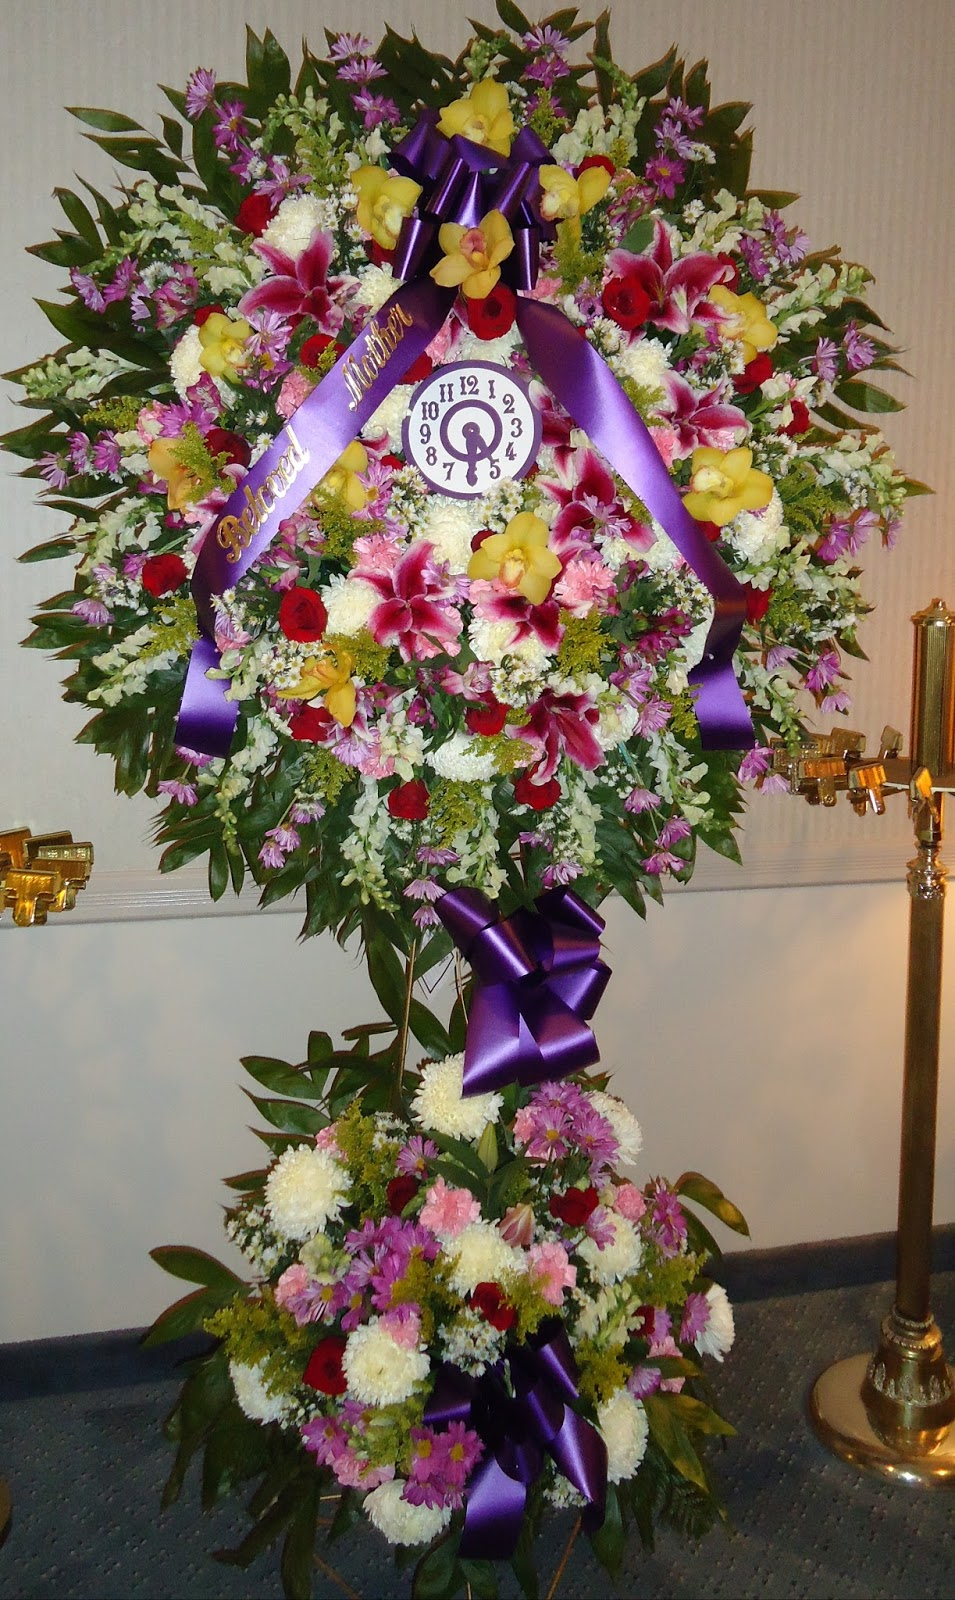 Glendale florist funeral designs wreaths izmirmasajfo